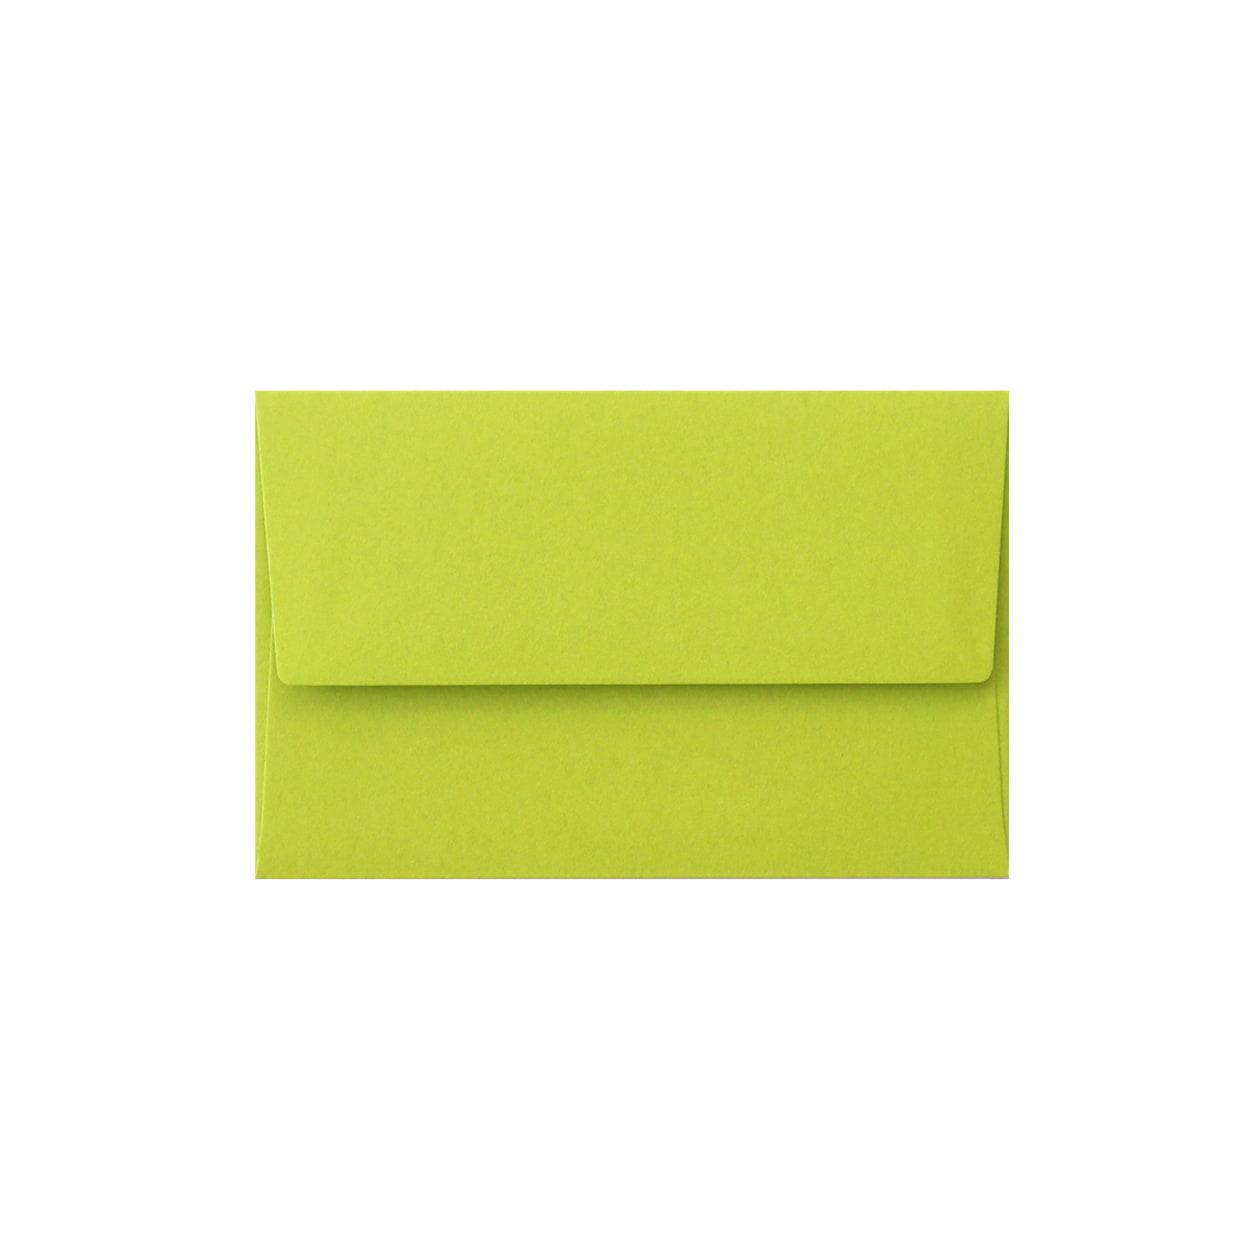 NEカマス封筒 コットン(NTラシャ) 黄緑 116.3g